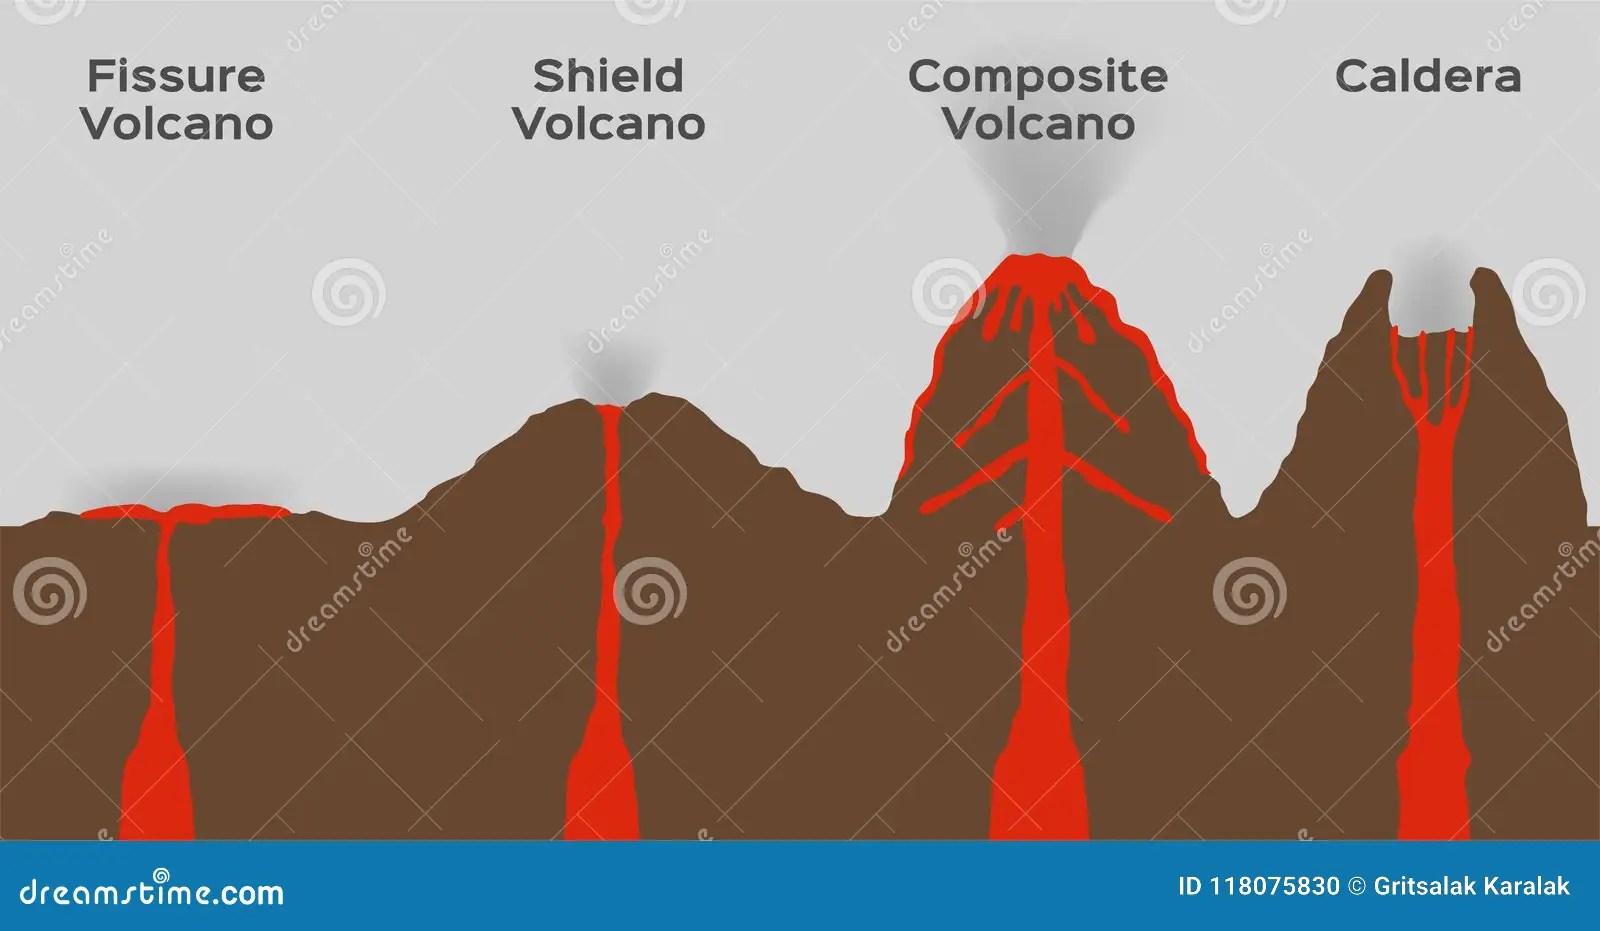 Type De Volcan Infographic Vecteur Compose Et Caldeira De